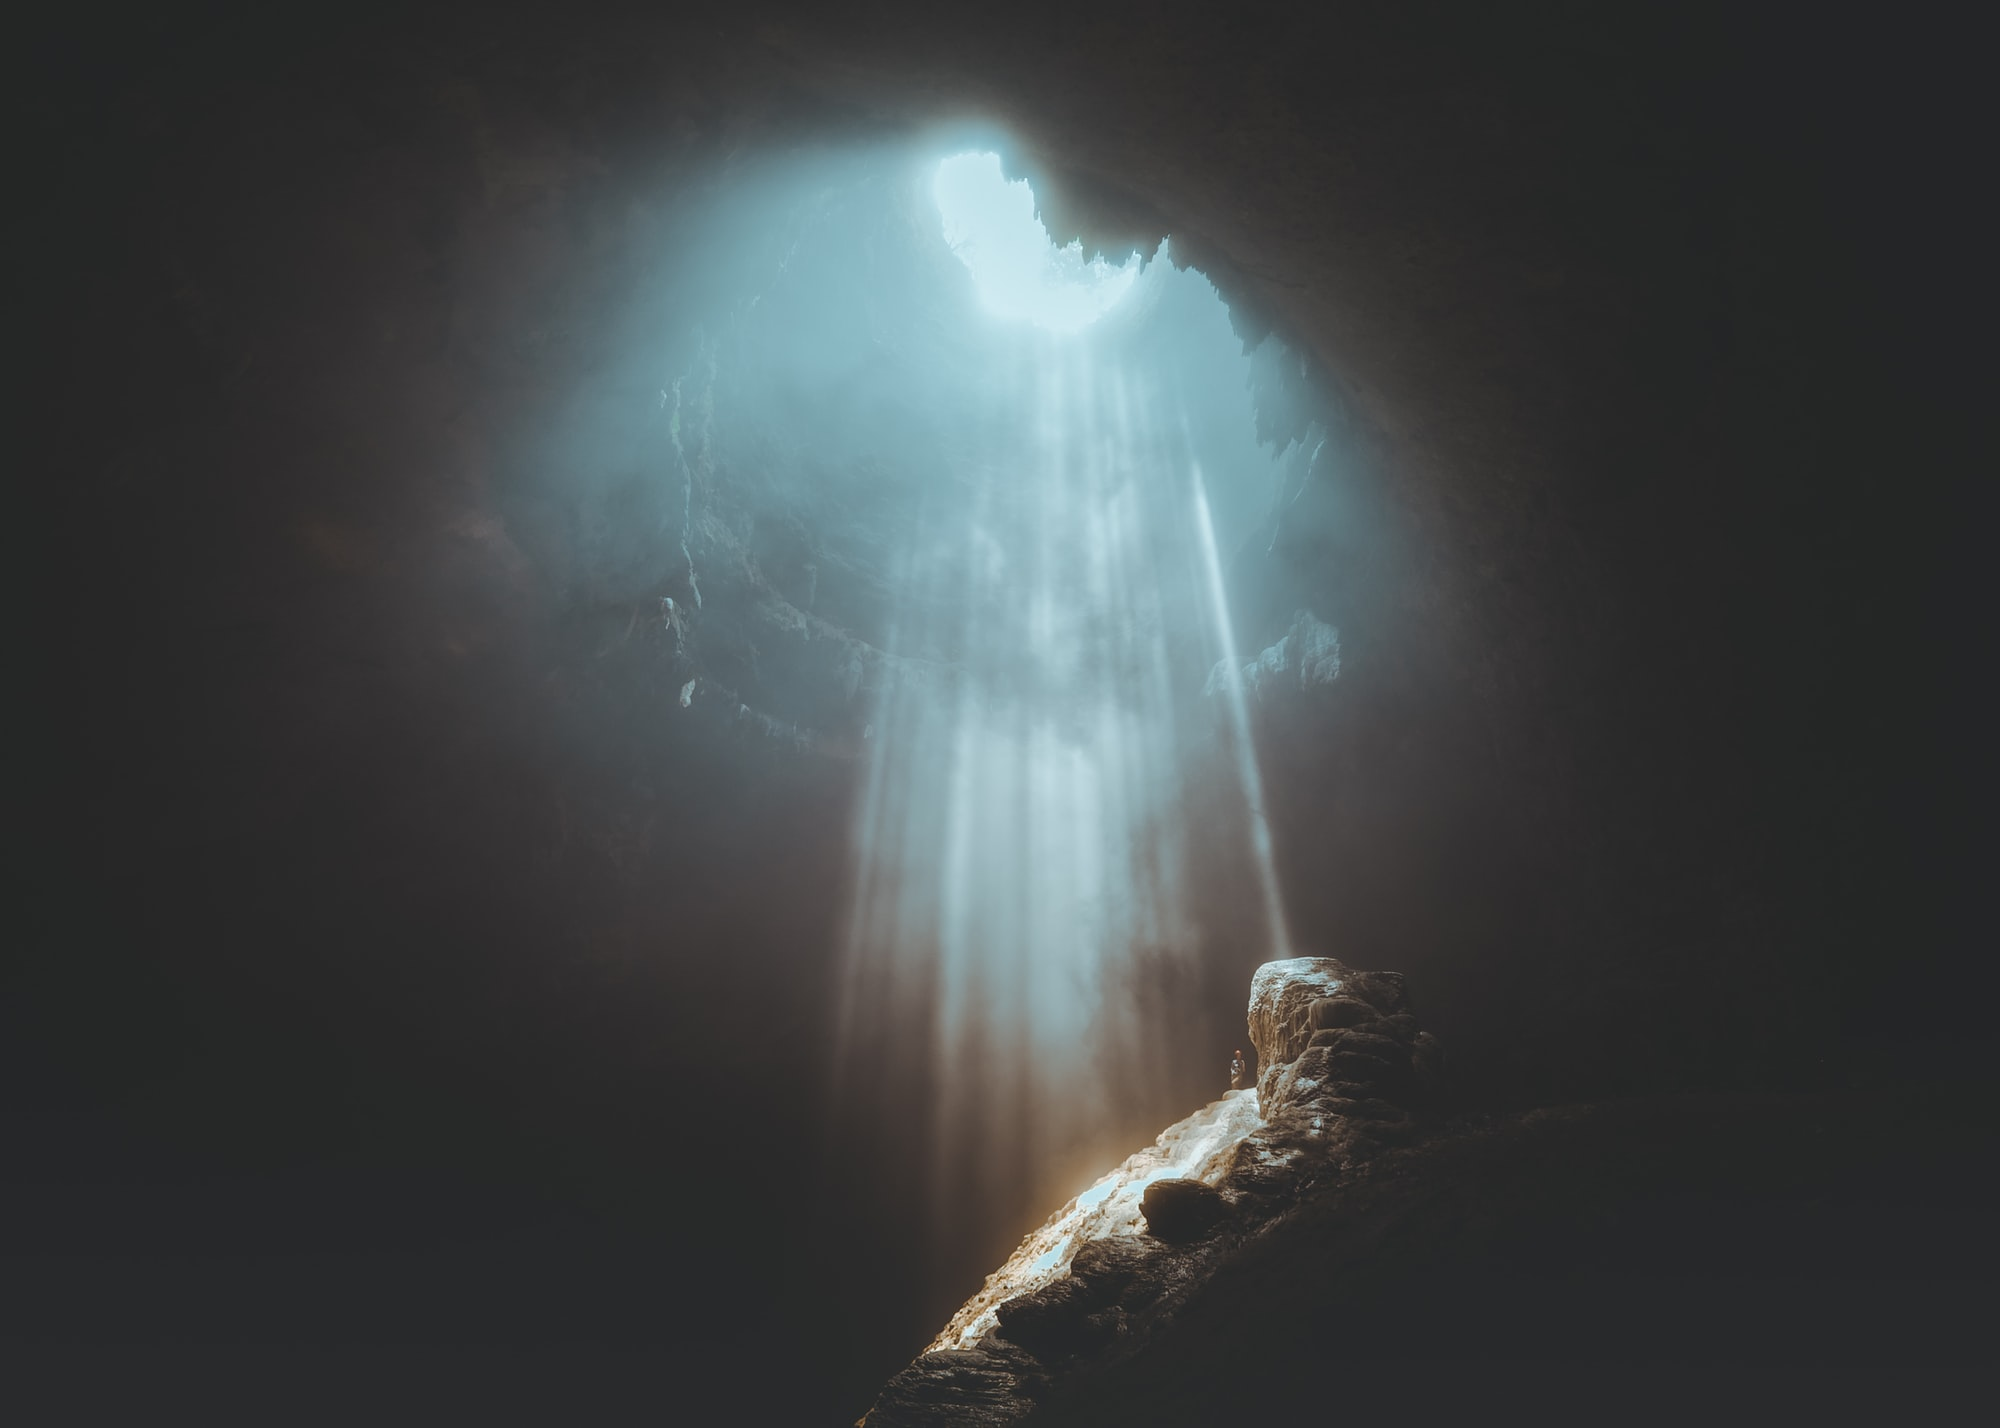 [074] WorkFlowy: 開門又是一片新天地